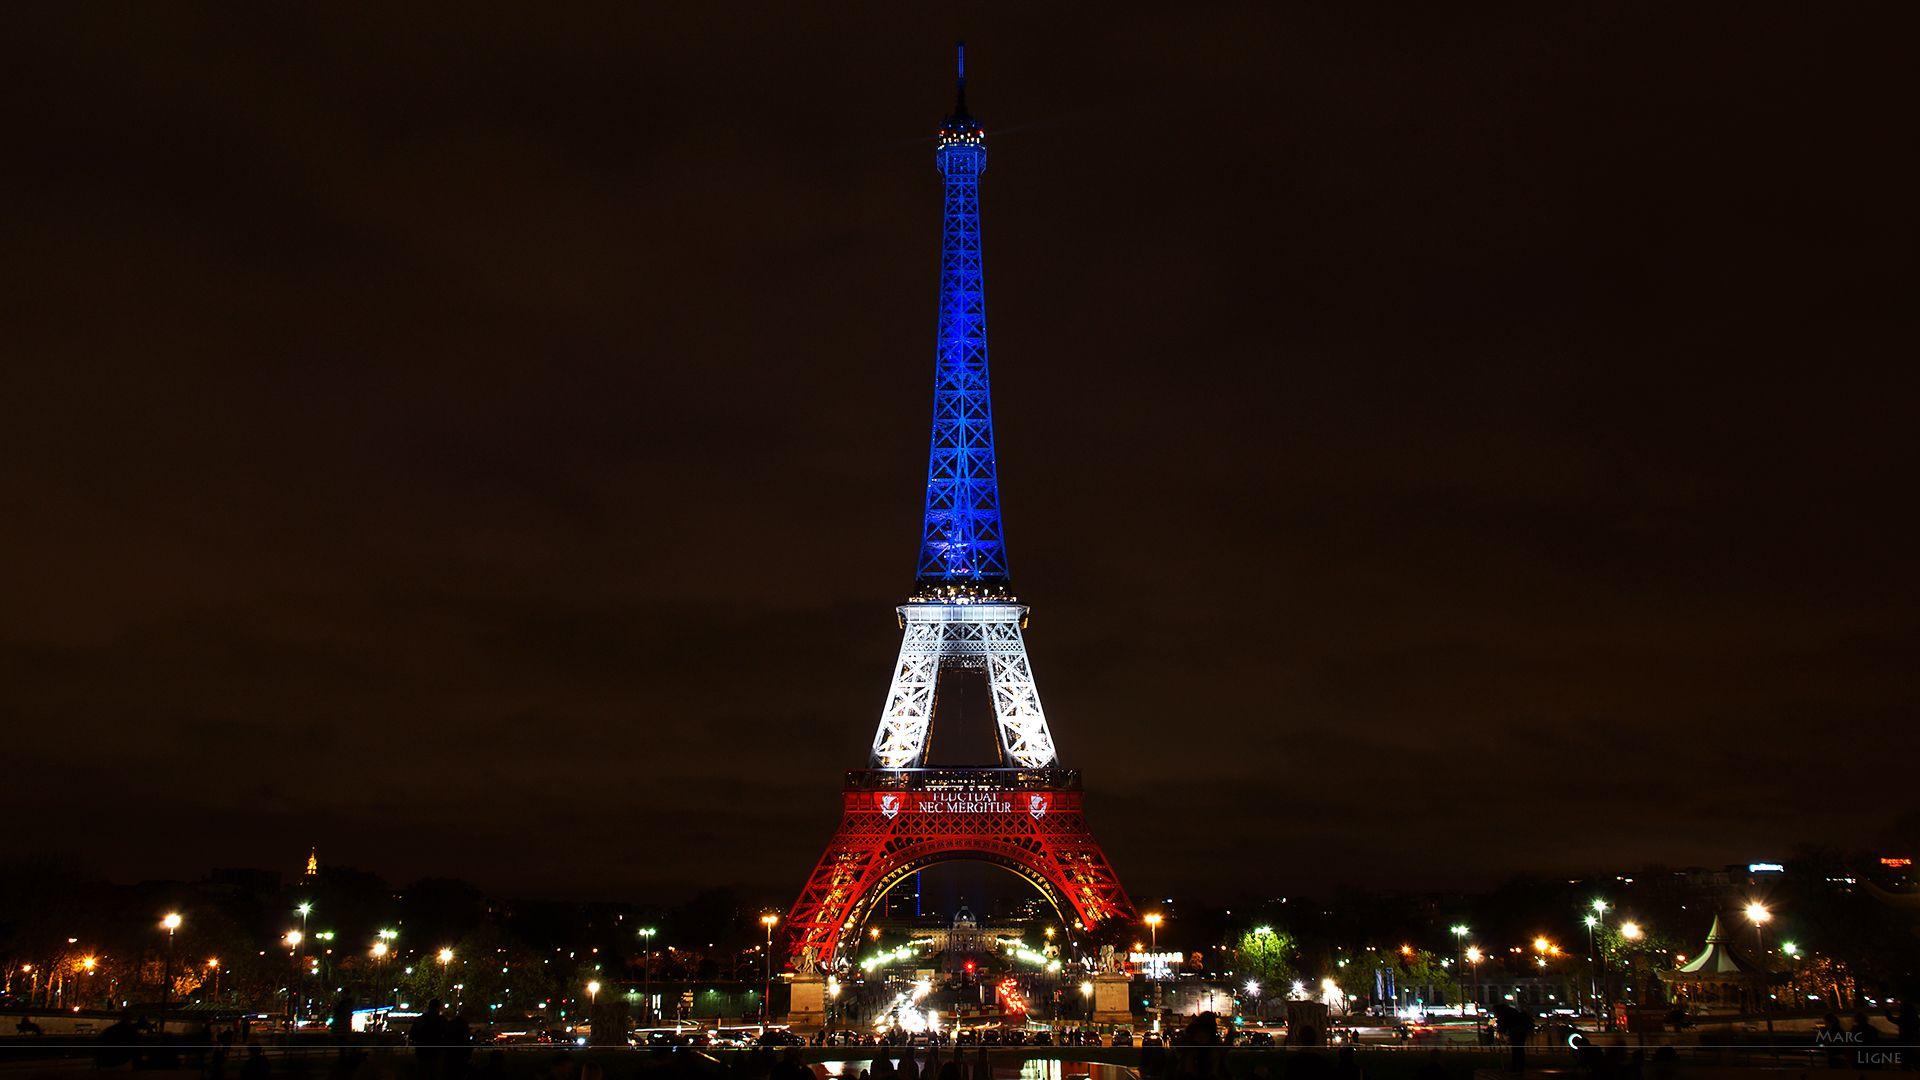 City Eiffel Tower France Light Night Paris 1920x1080